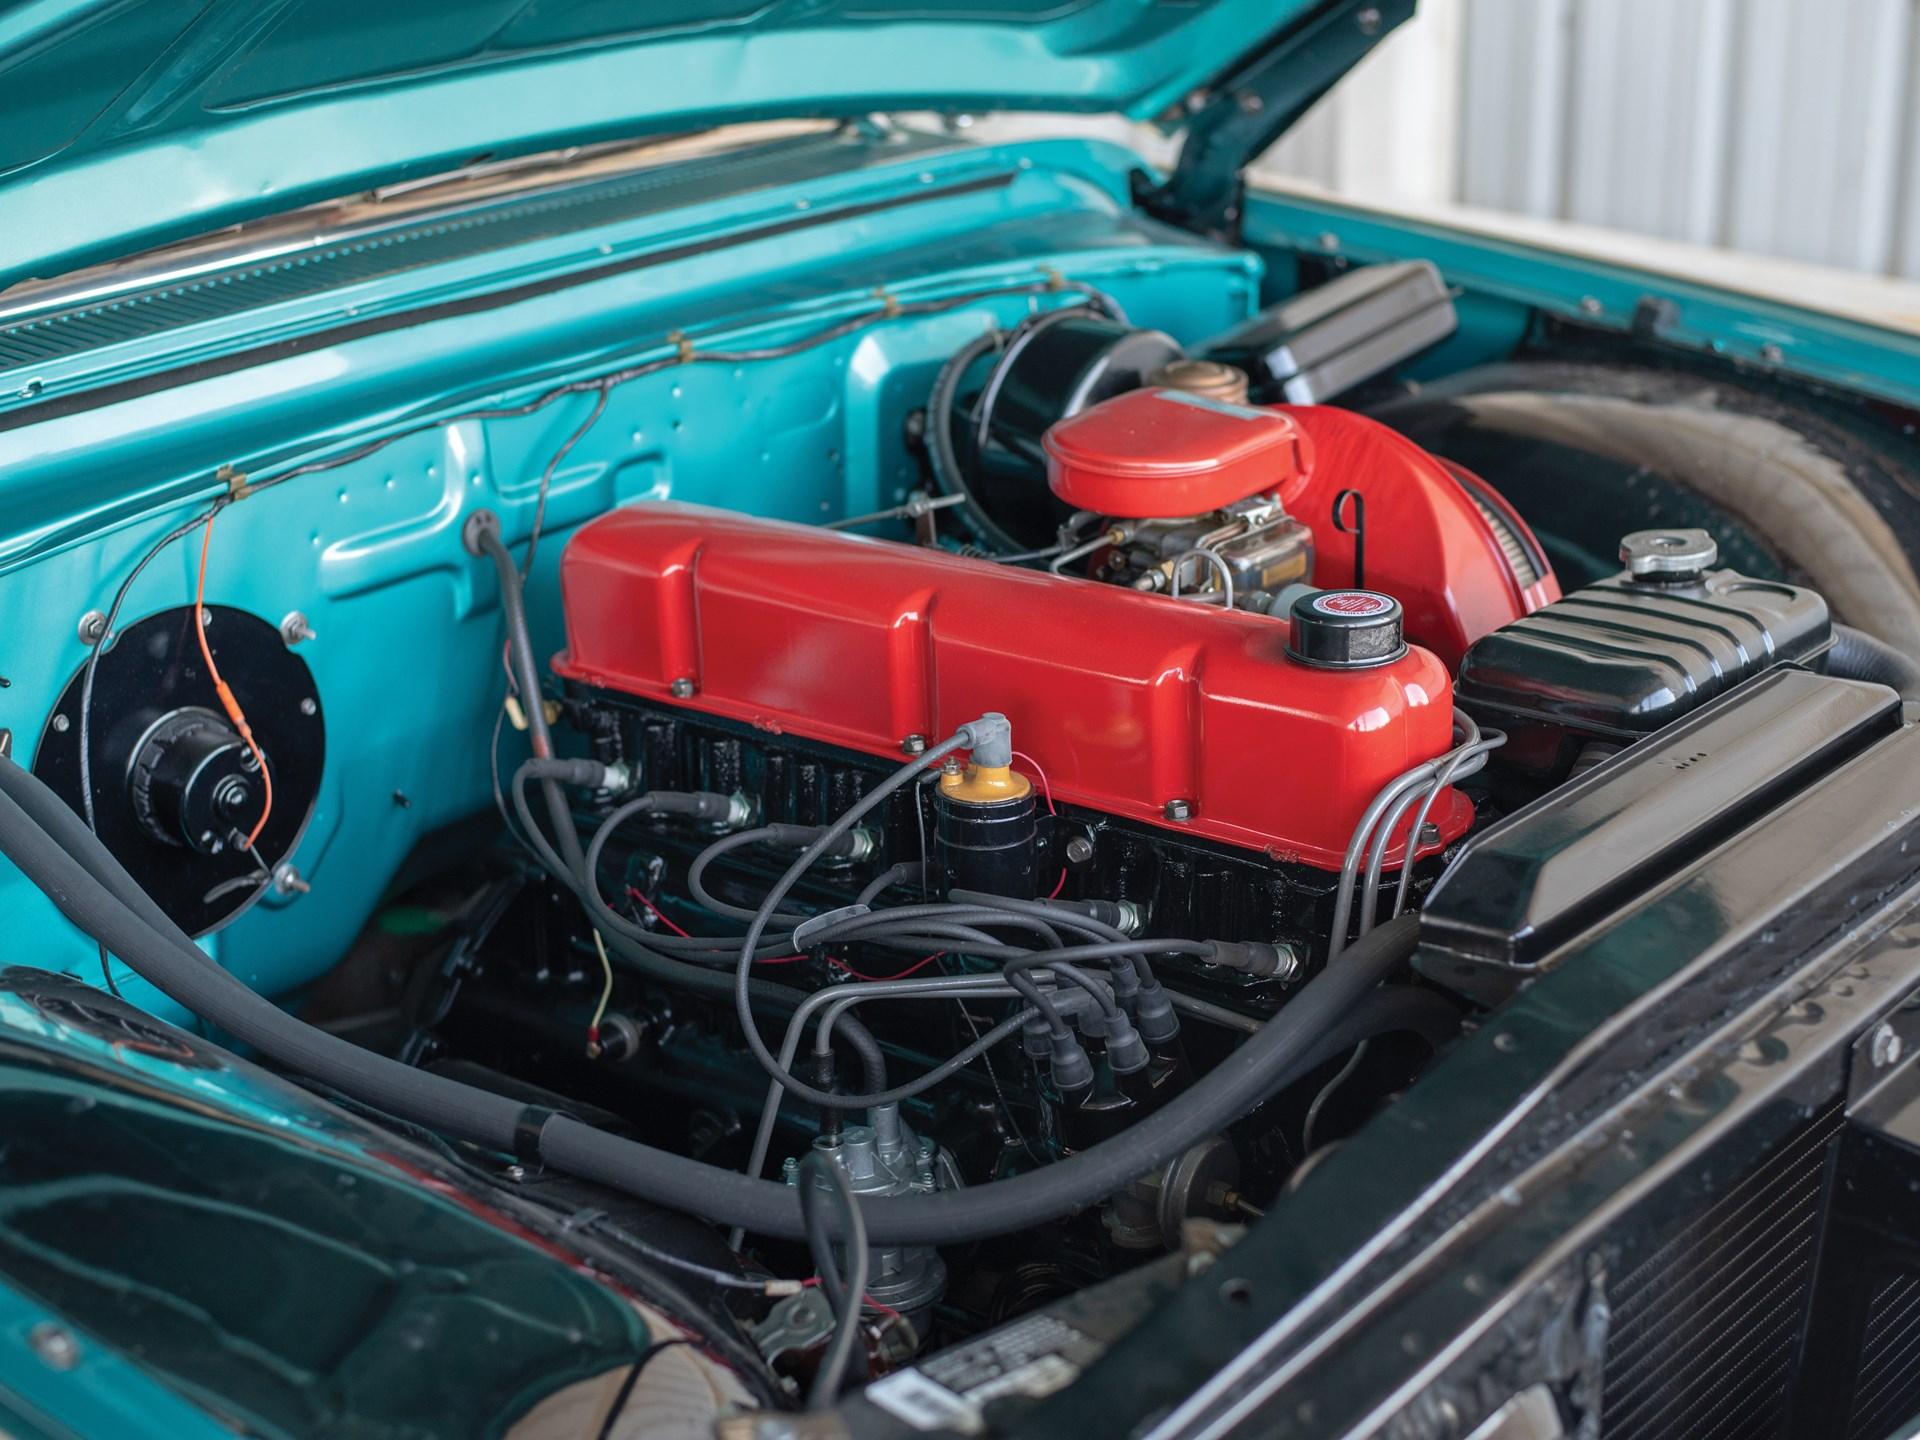 1960 Edsel Ranger Two-Door Sedan